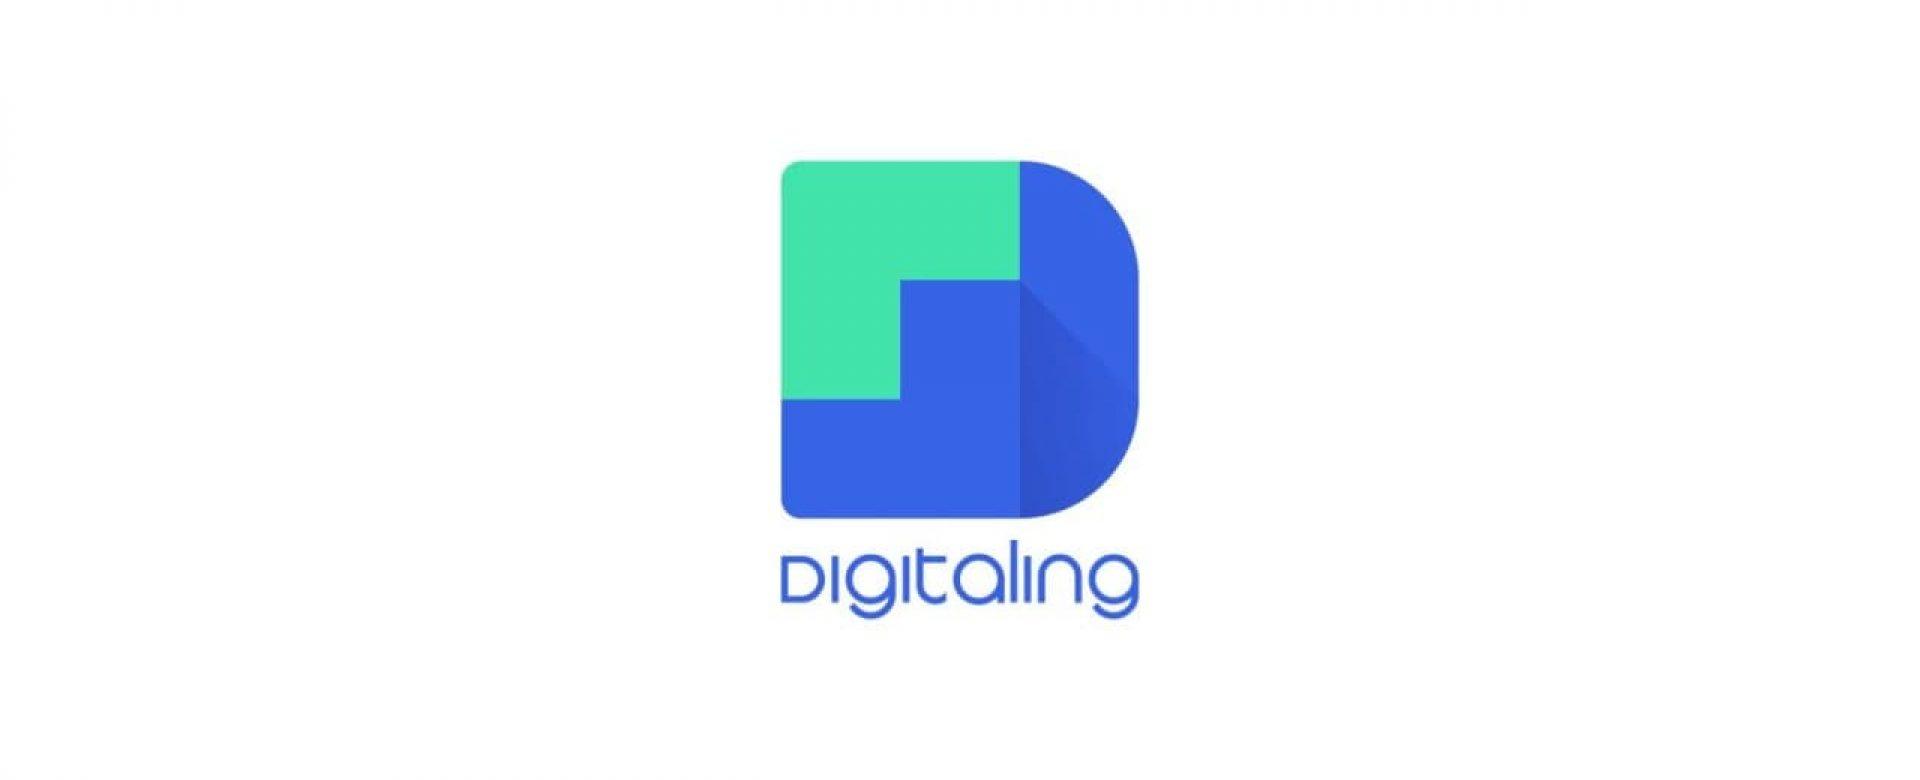 طراحی لوگو دیجیتالینگ آژانس برندسازی ذن zen branding agency digitaling logo design